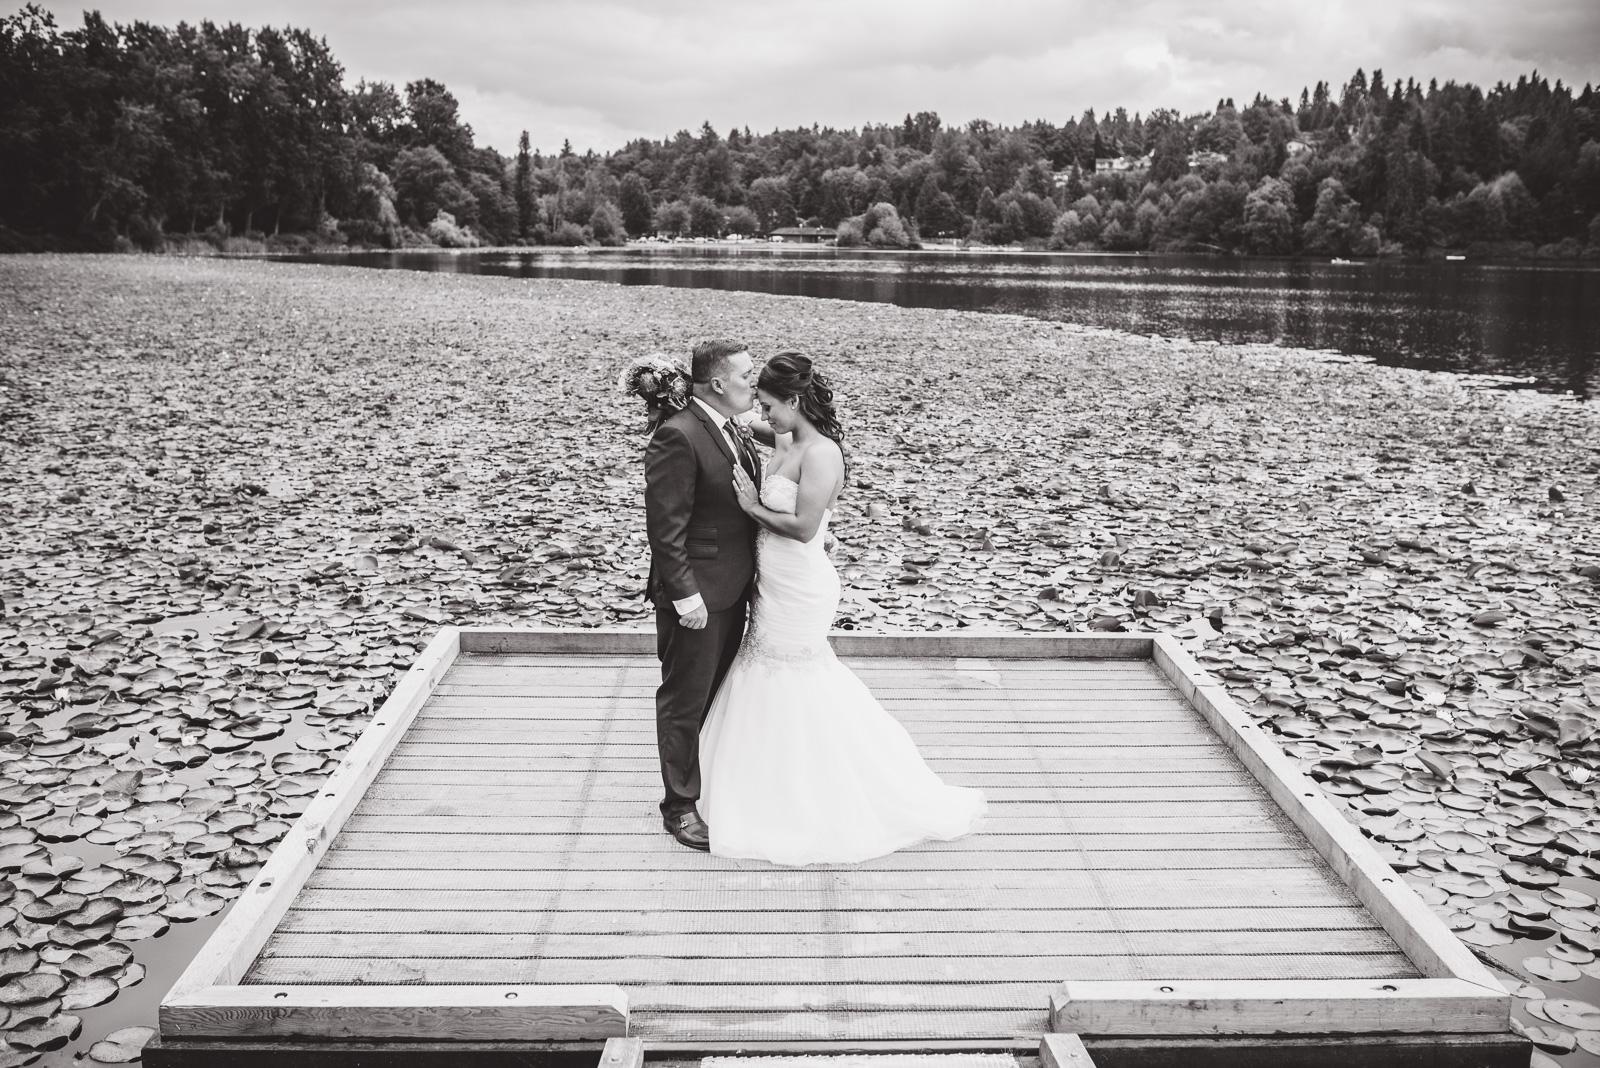 victoria-wedding-photographers-burnaby-mountain-wedding-burnaby-rowing-club-wedding-28.jpg